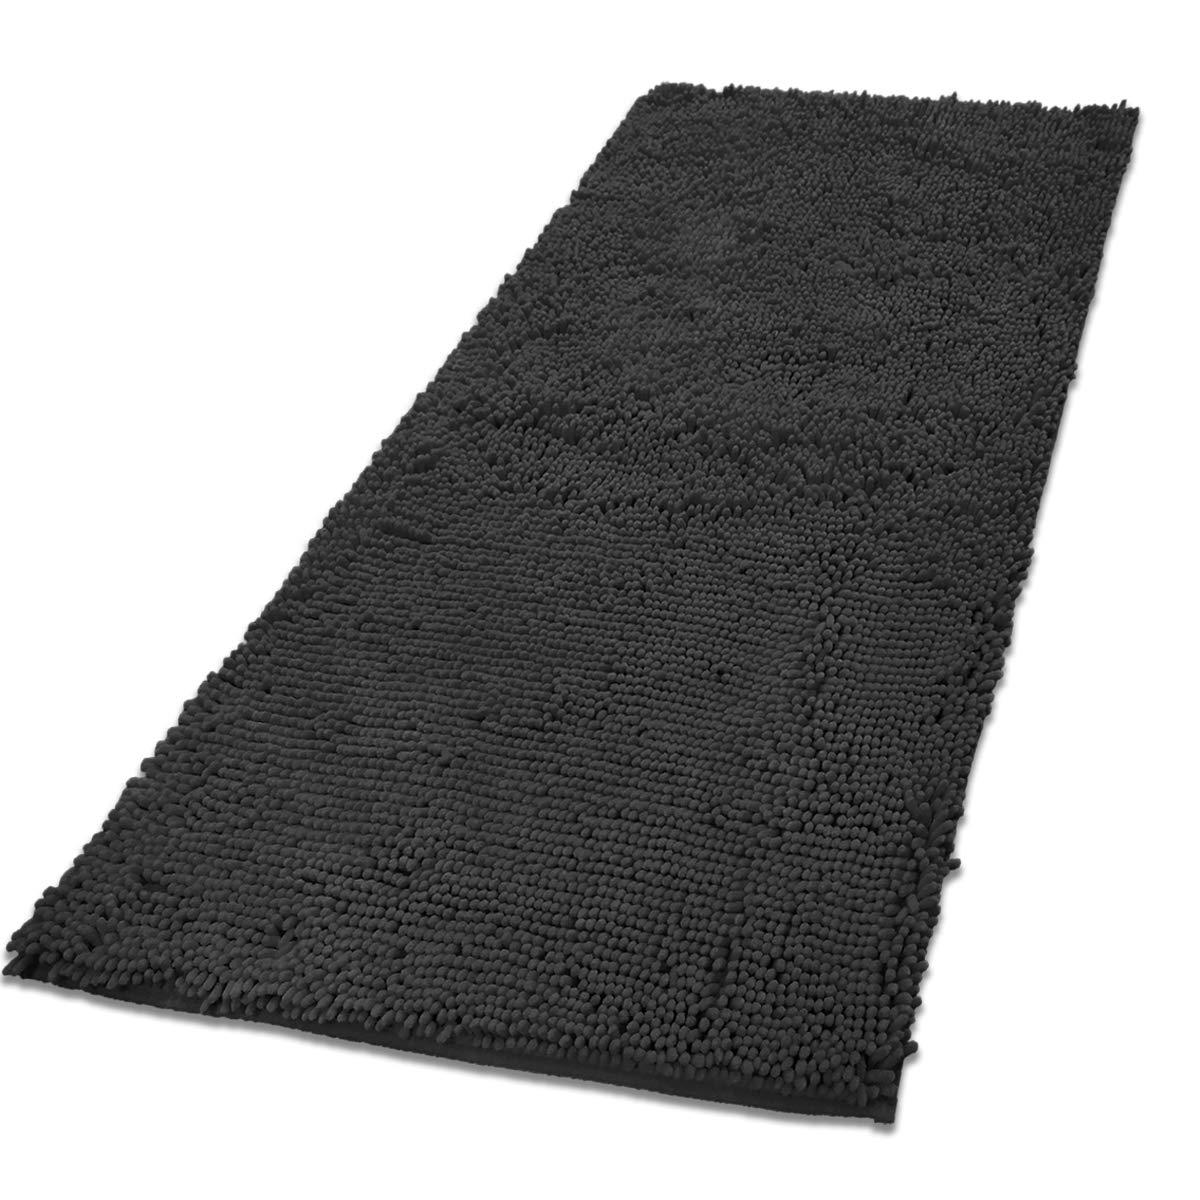 MAYSHINE Chenille Bath Mat Dog Door mat (31''x59'') Runner for Front Inside Floor Dirty Trapper Doormats, Quick Drying, Washable, Prevent Mud Dirt - Dark Gray